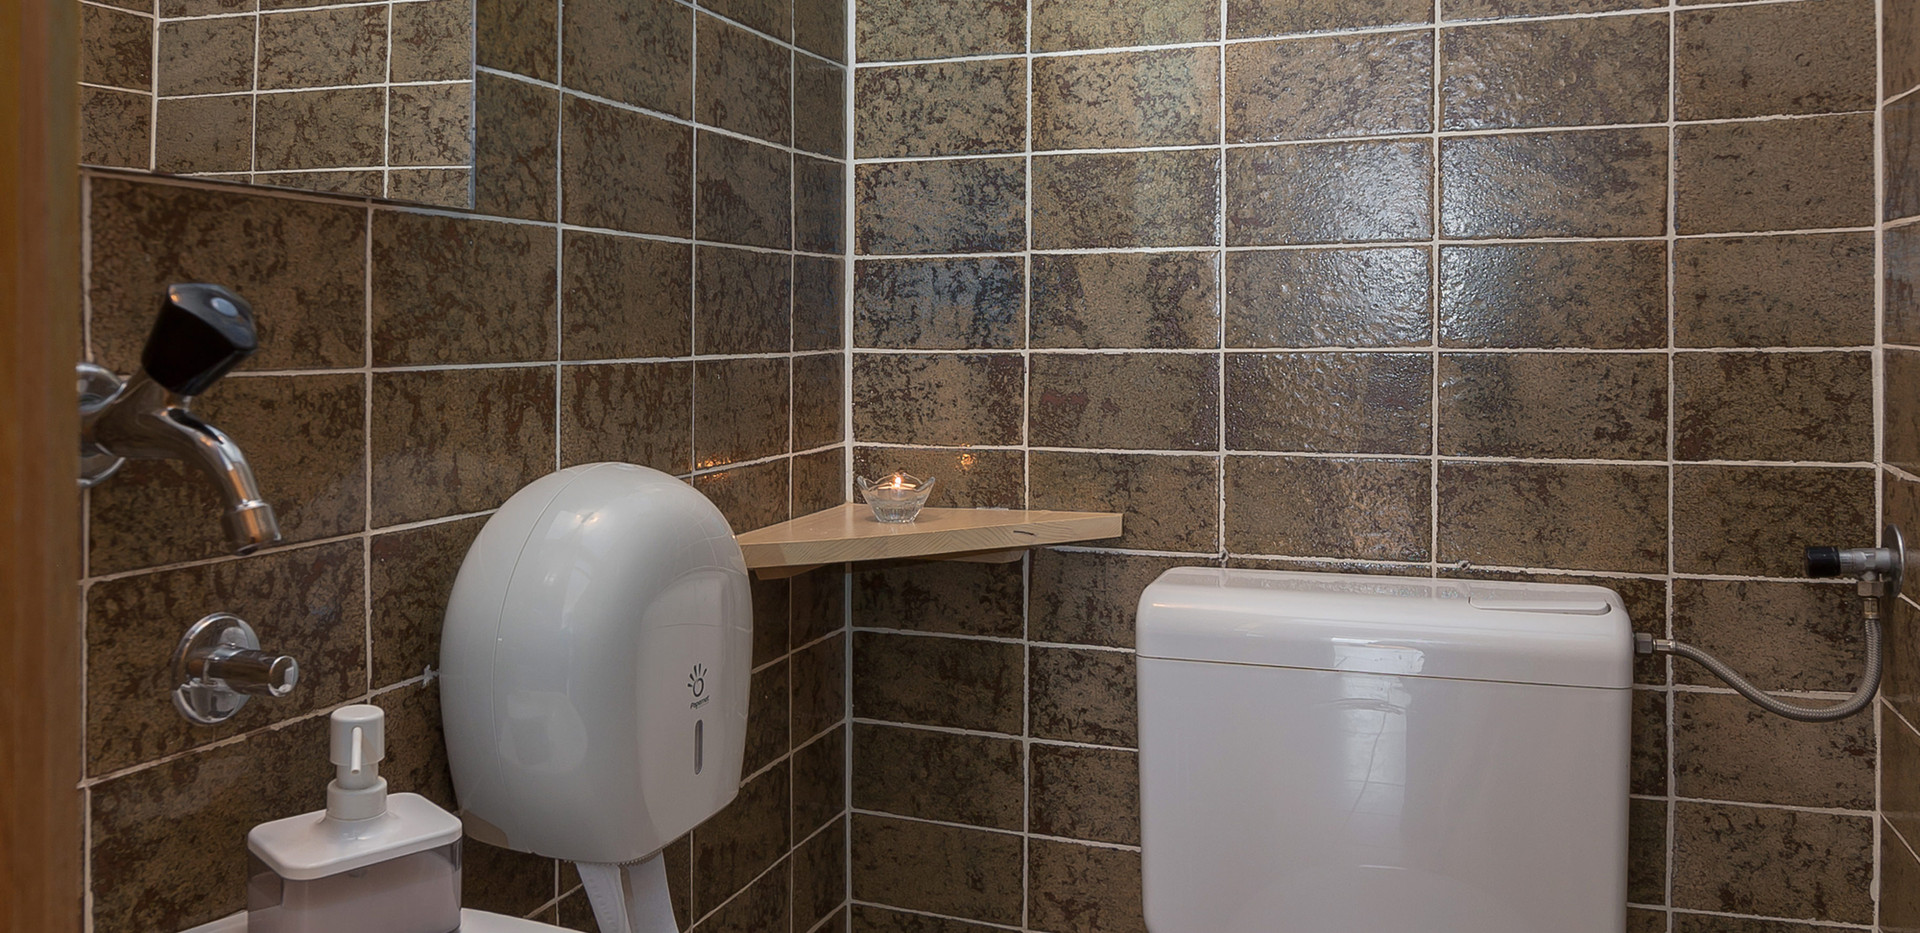 C-301-bathroom_2207.jpg